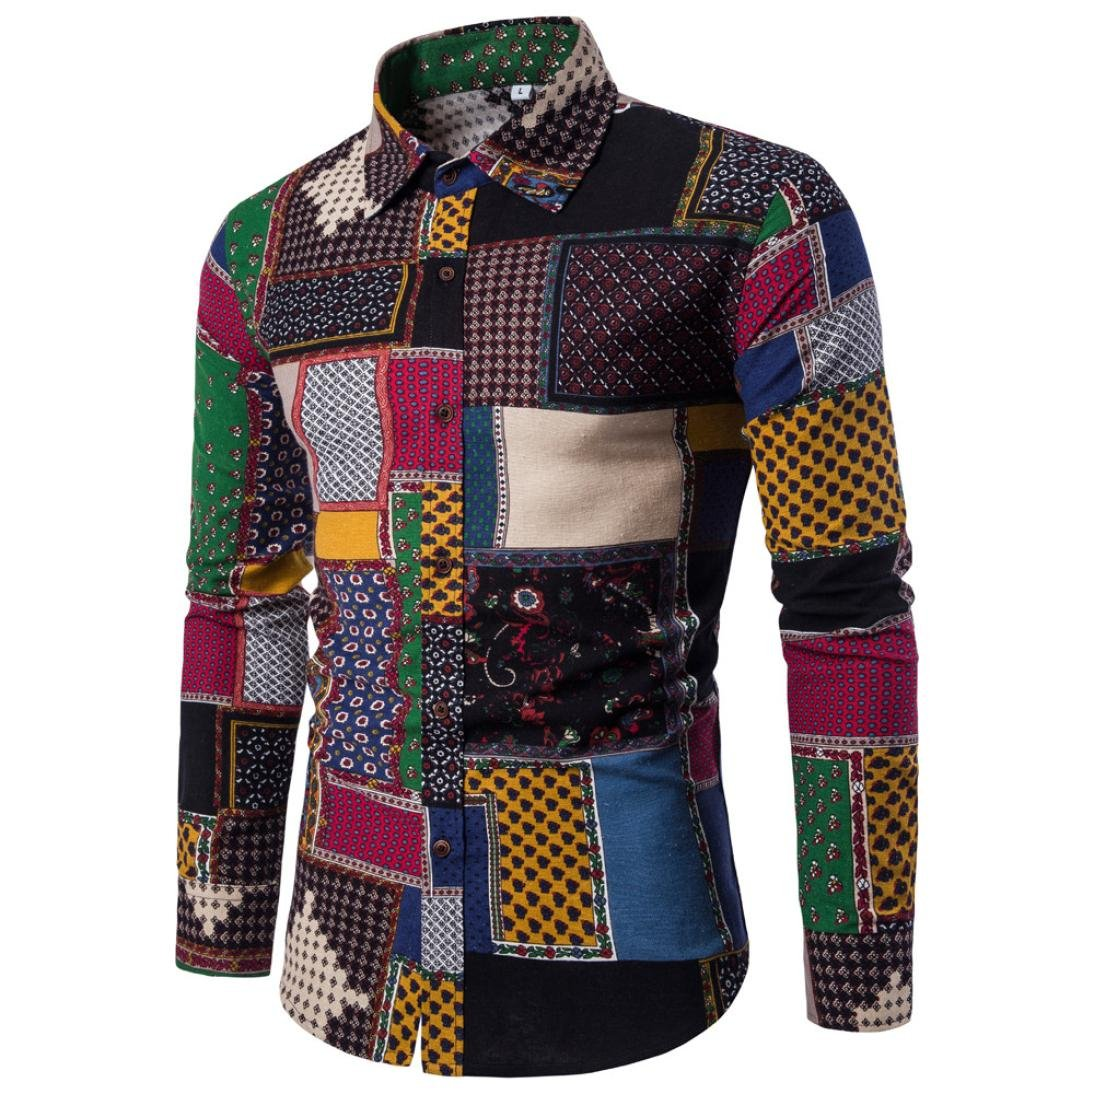 M, Multicolor 2 Men Shirts Daoroka Mens Boy Plus Size Casual Patchwork Printed Long Sleeve Button Collar Blouse Slim Fit Fashion Tops Comfort T Shirt